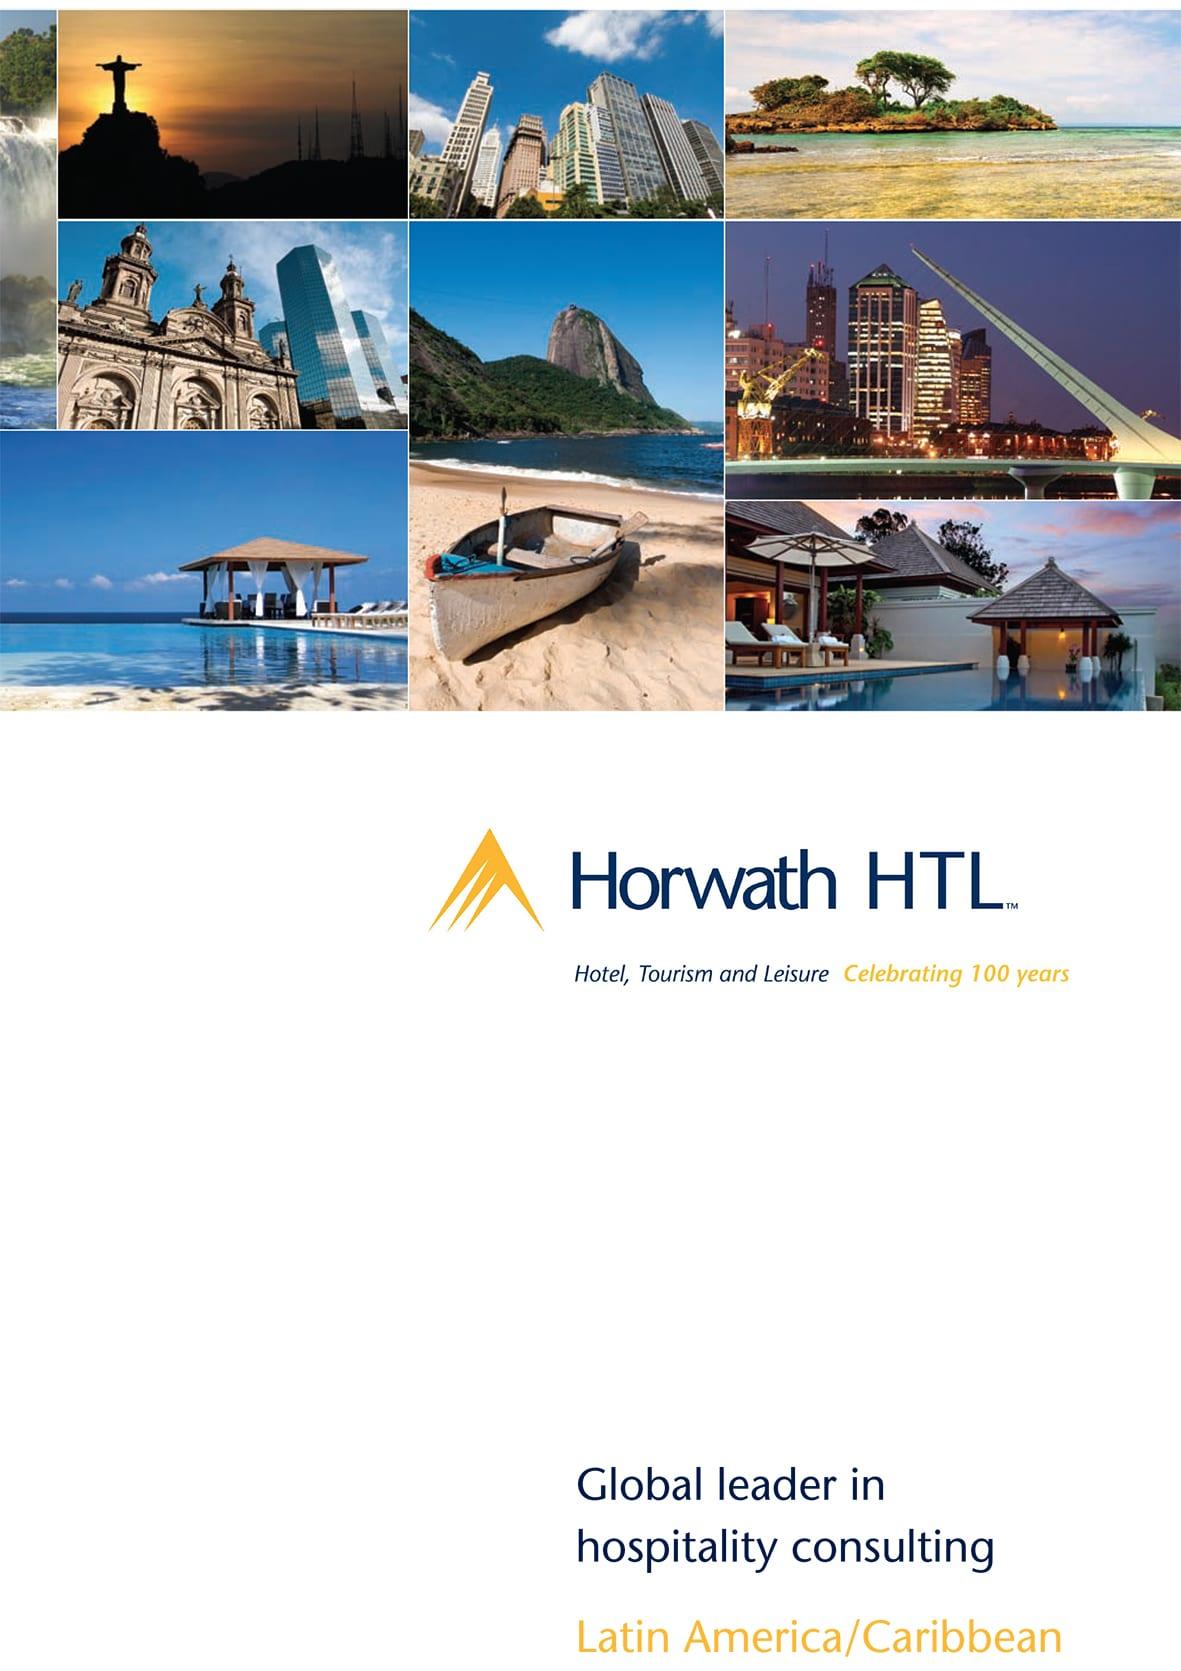 HorwathHTL LAC231015 1 1